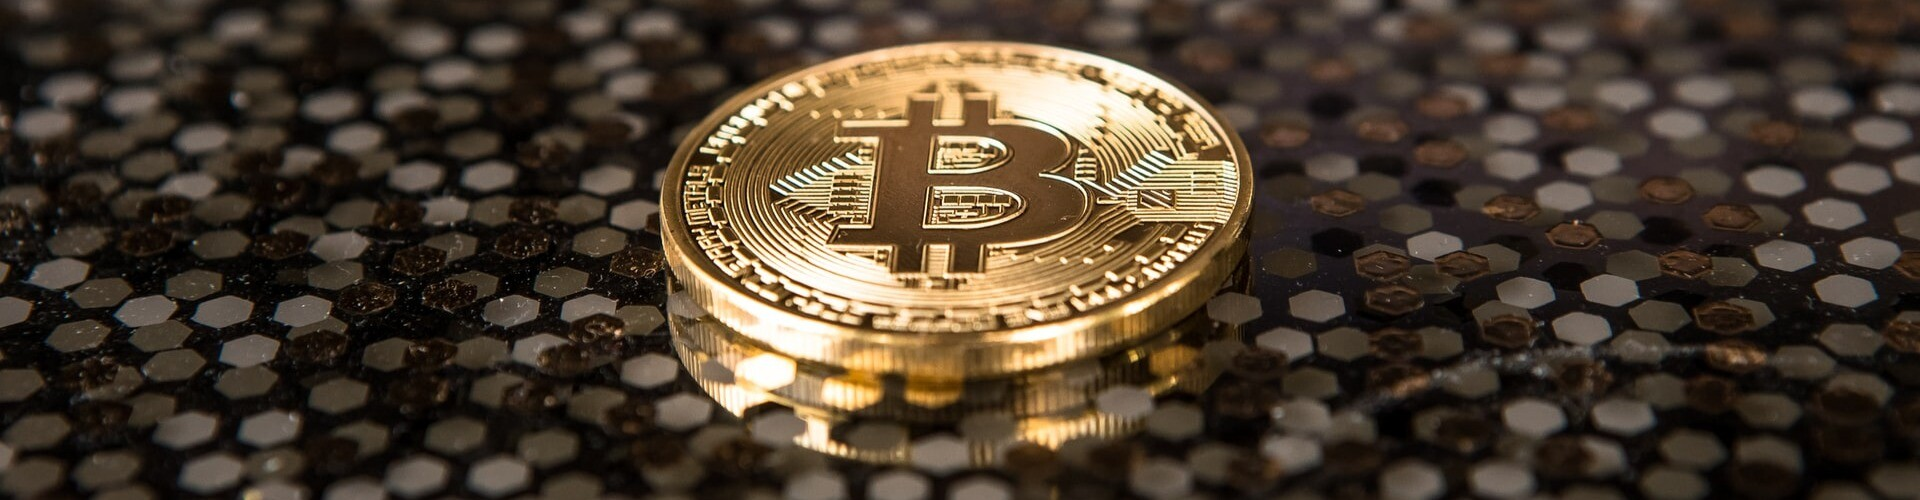 CryptoBlonde